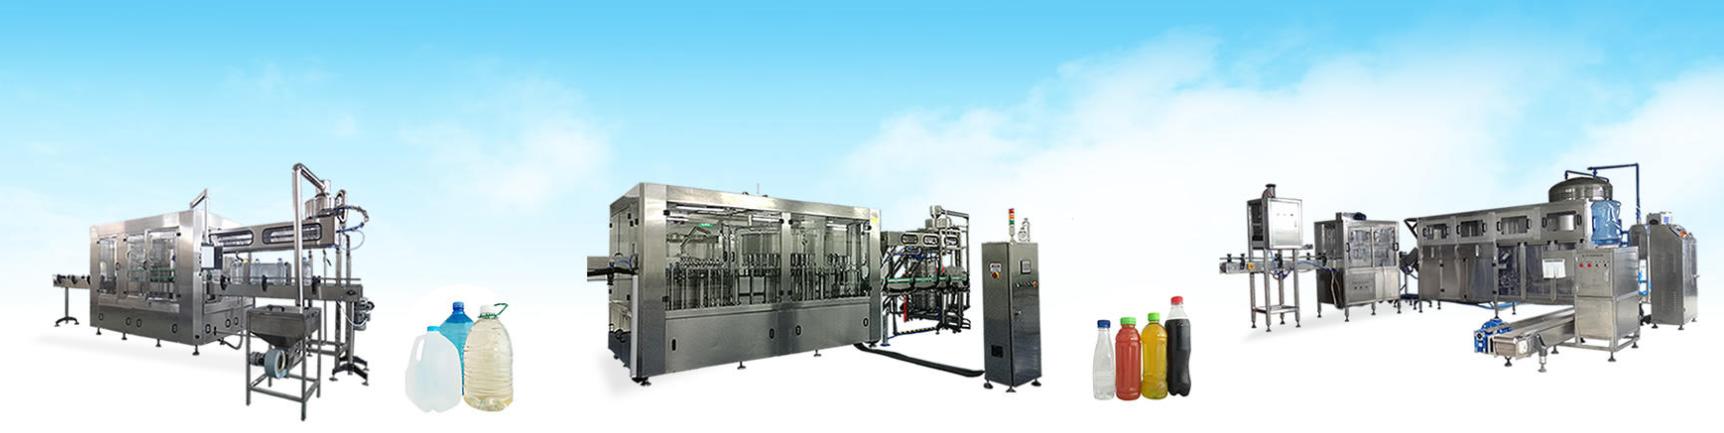 JD WATER-Water Treatment Systems, Shenzhen Jd Drinking Water Equipment Co, Ltd